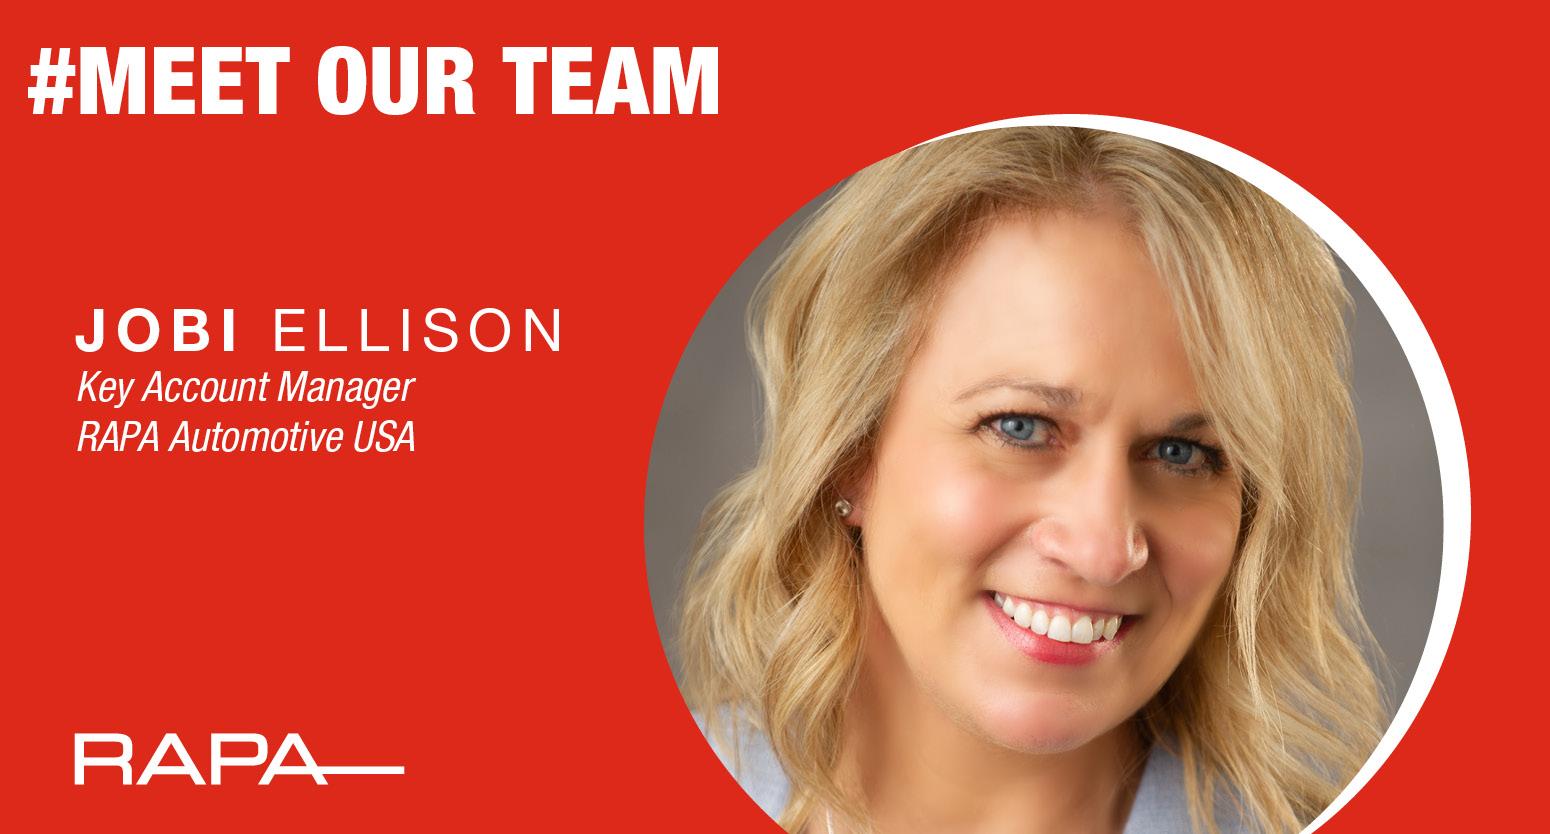 Meet Our Team: Jobi Ellison